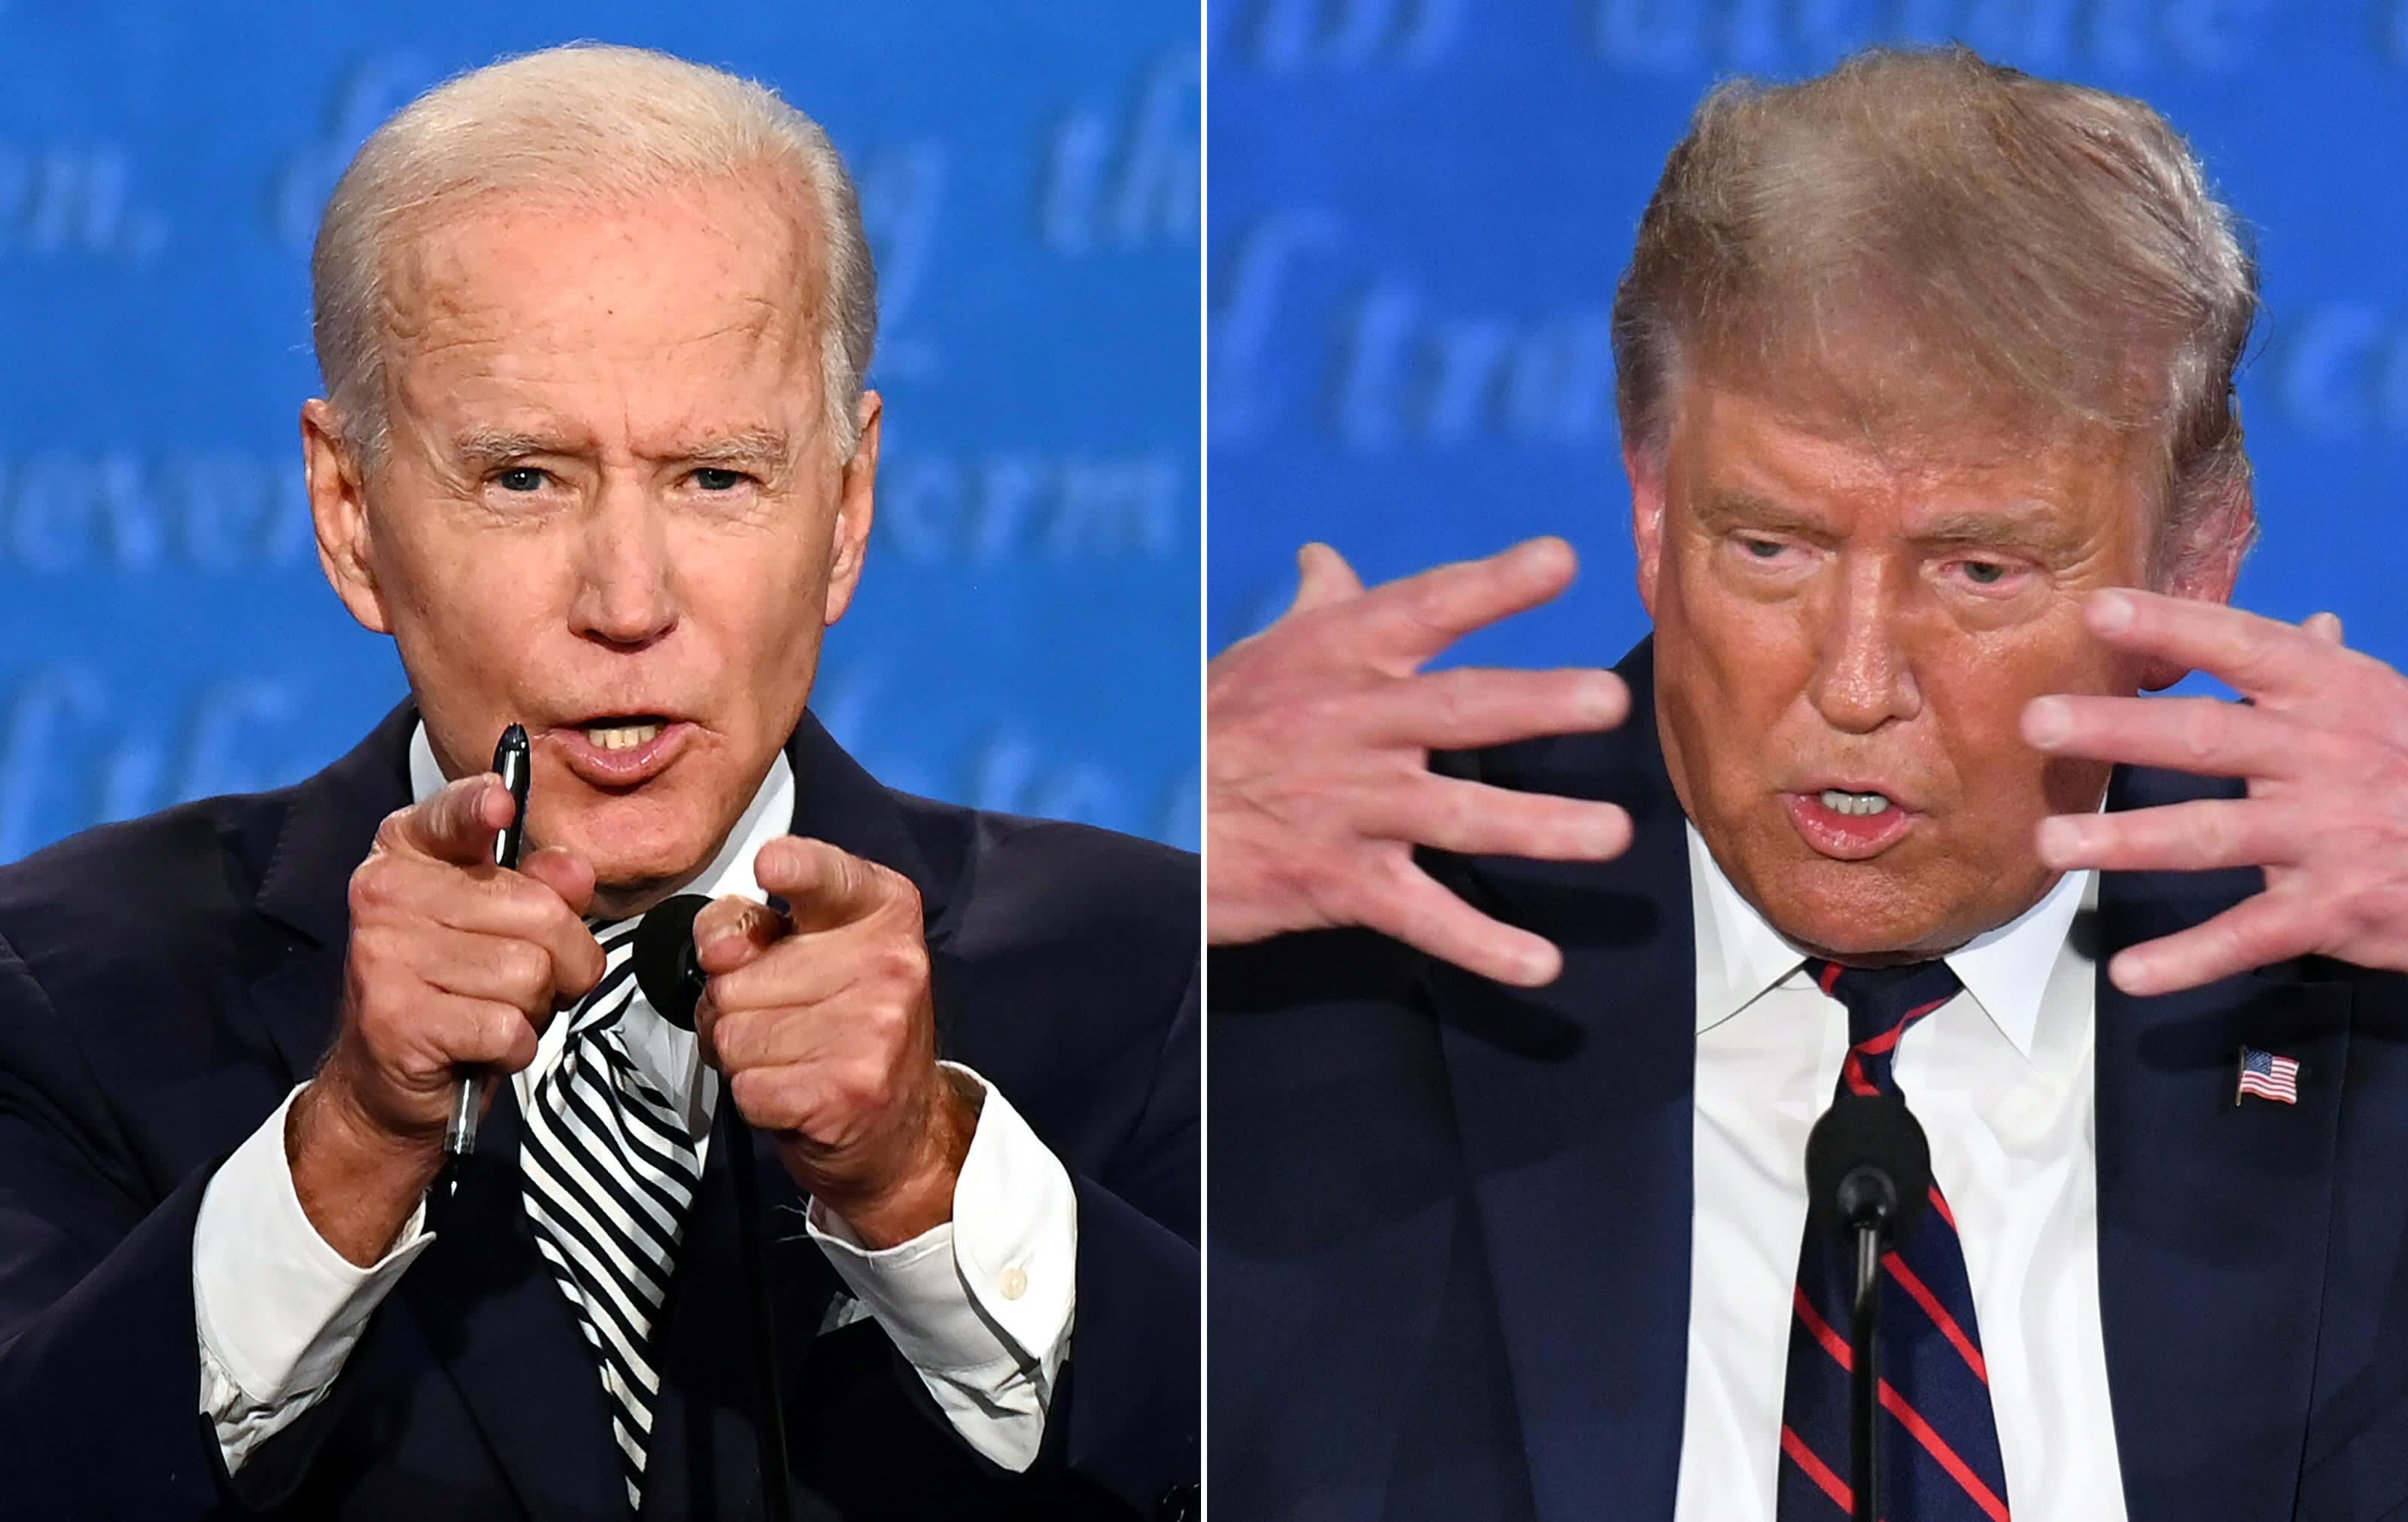 First presidential debate 2020: Trump vs. Biden highlights